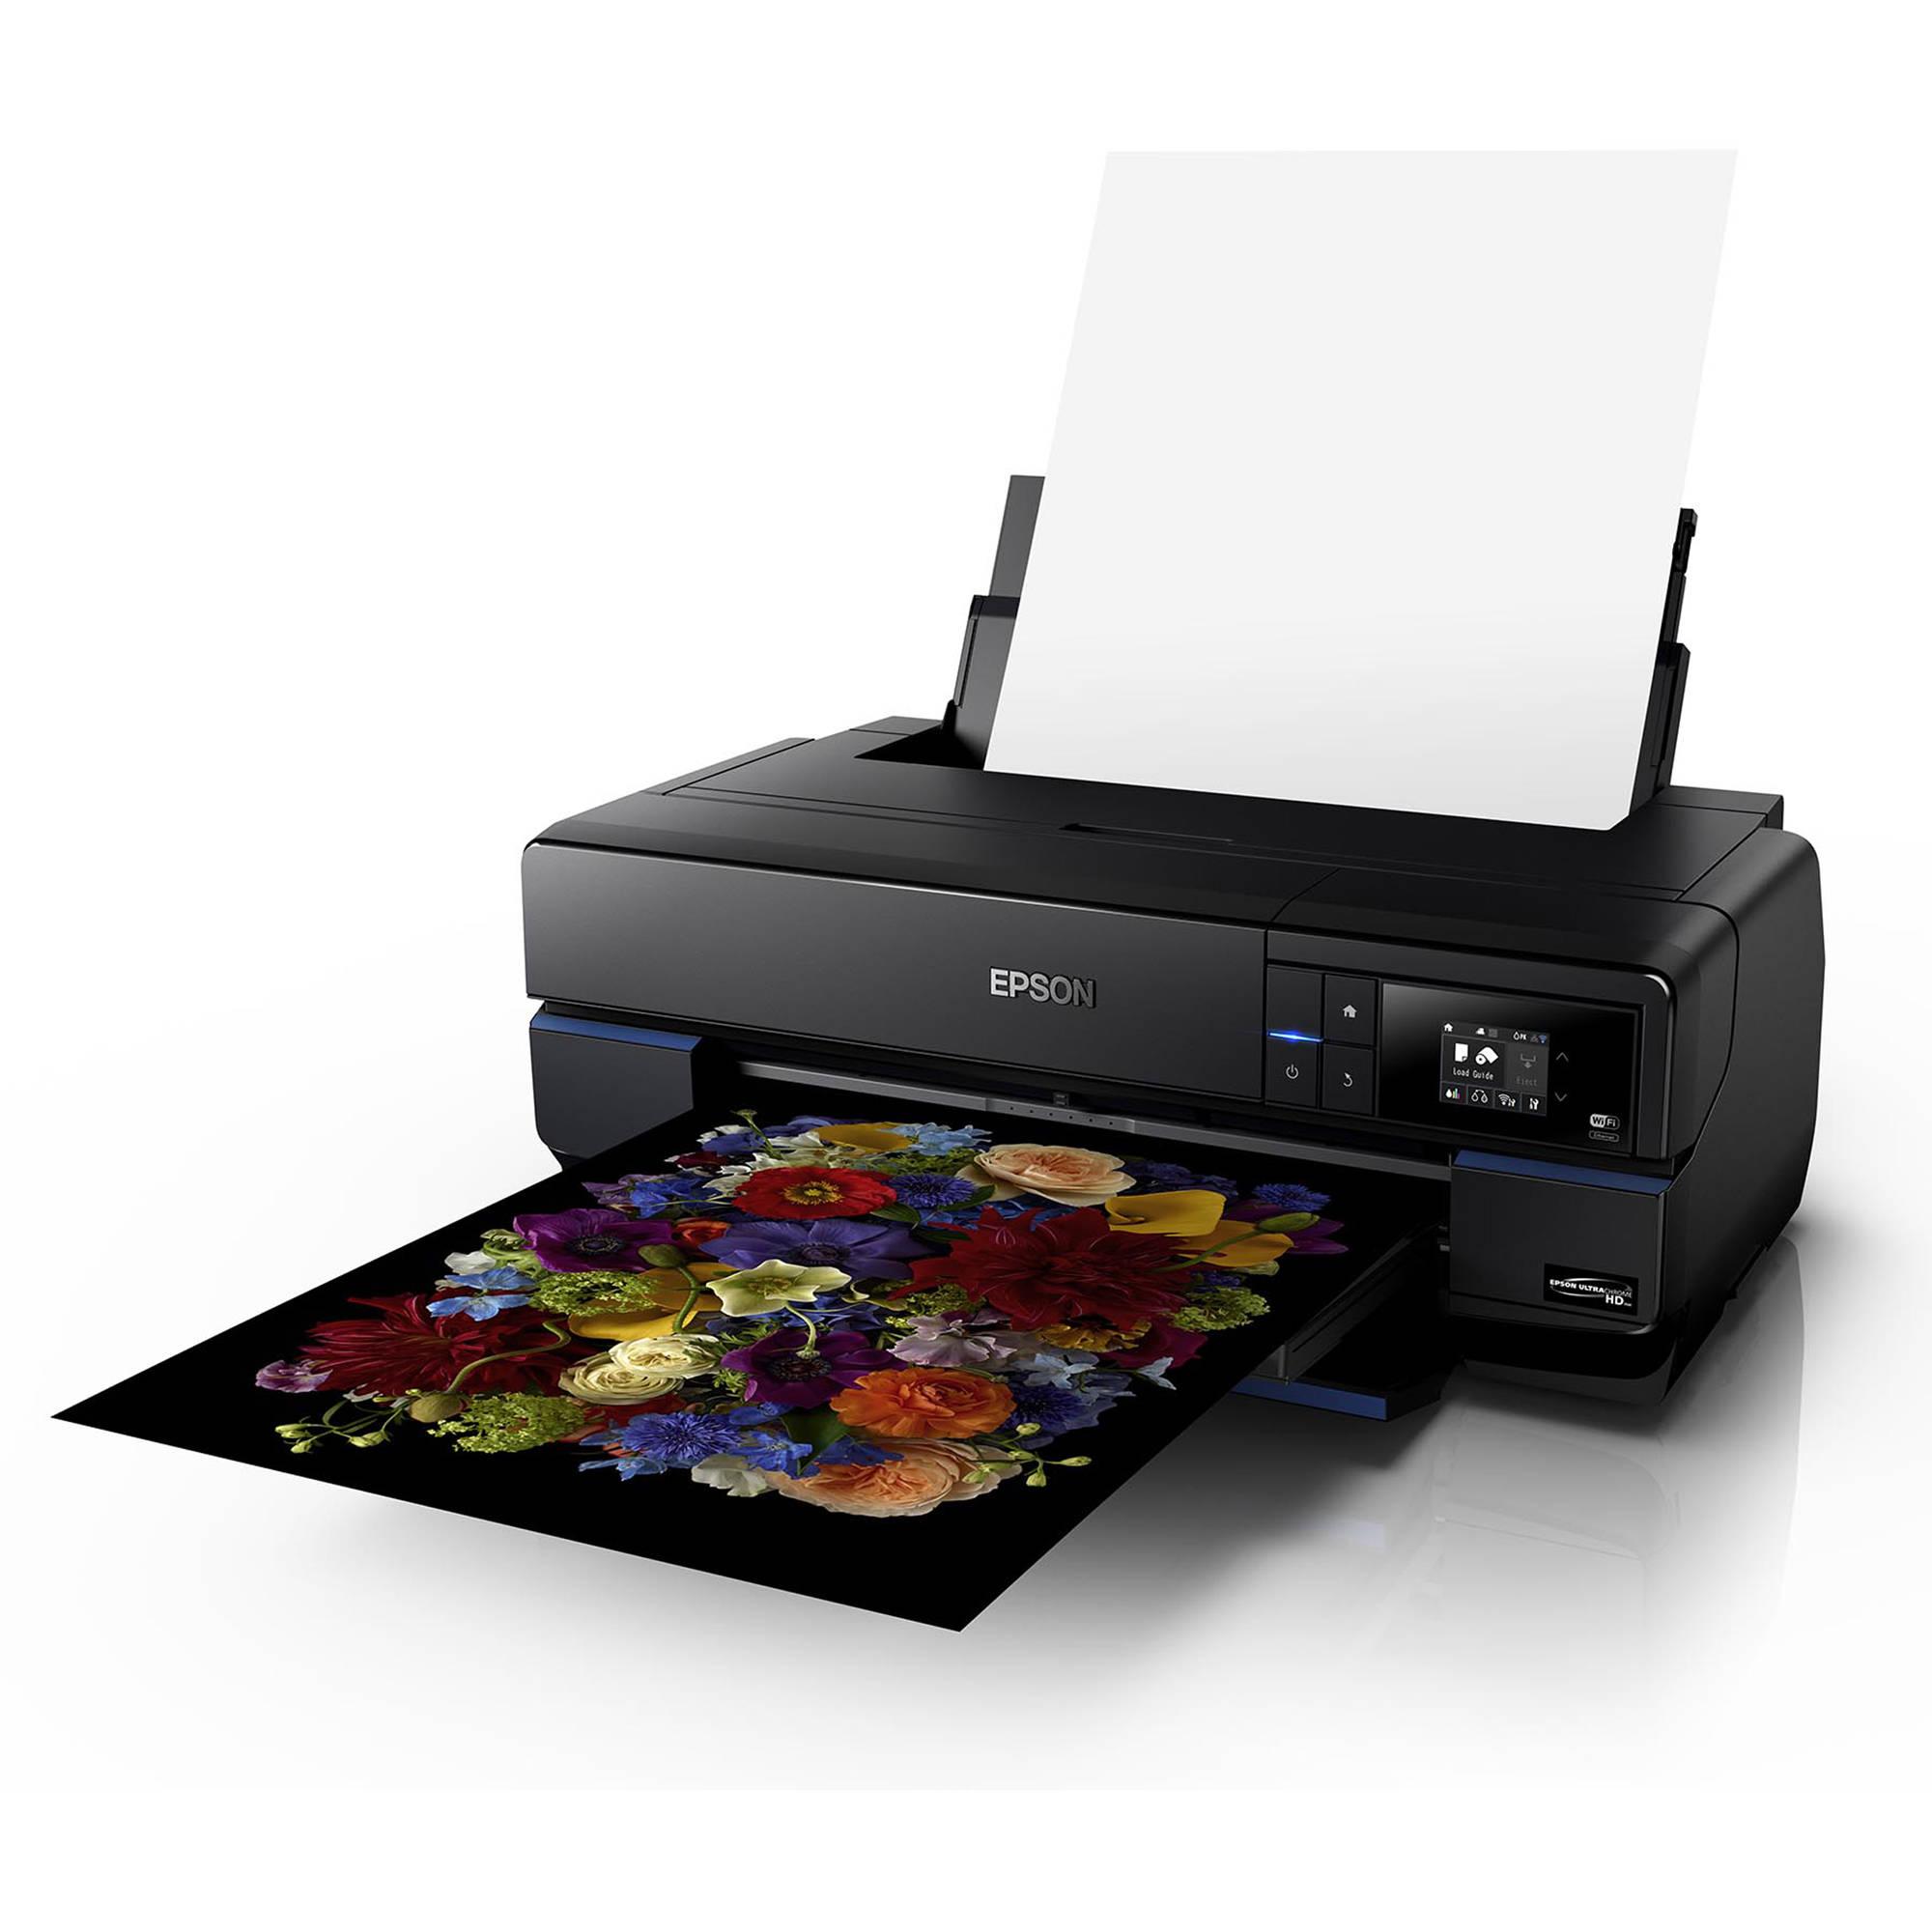 epson surecolor p800 inkjet printer scp800se b h photo video. Black Bedroom Furniture Sets. Home Design Ideas